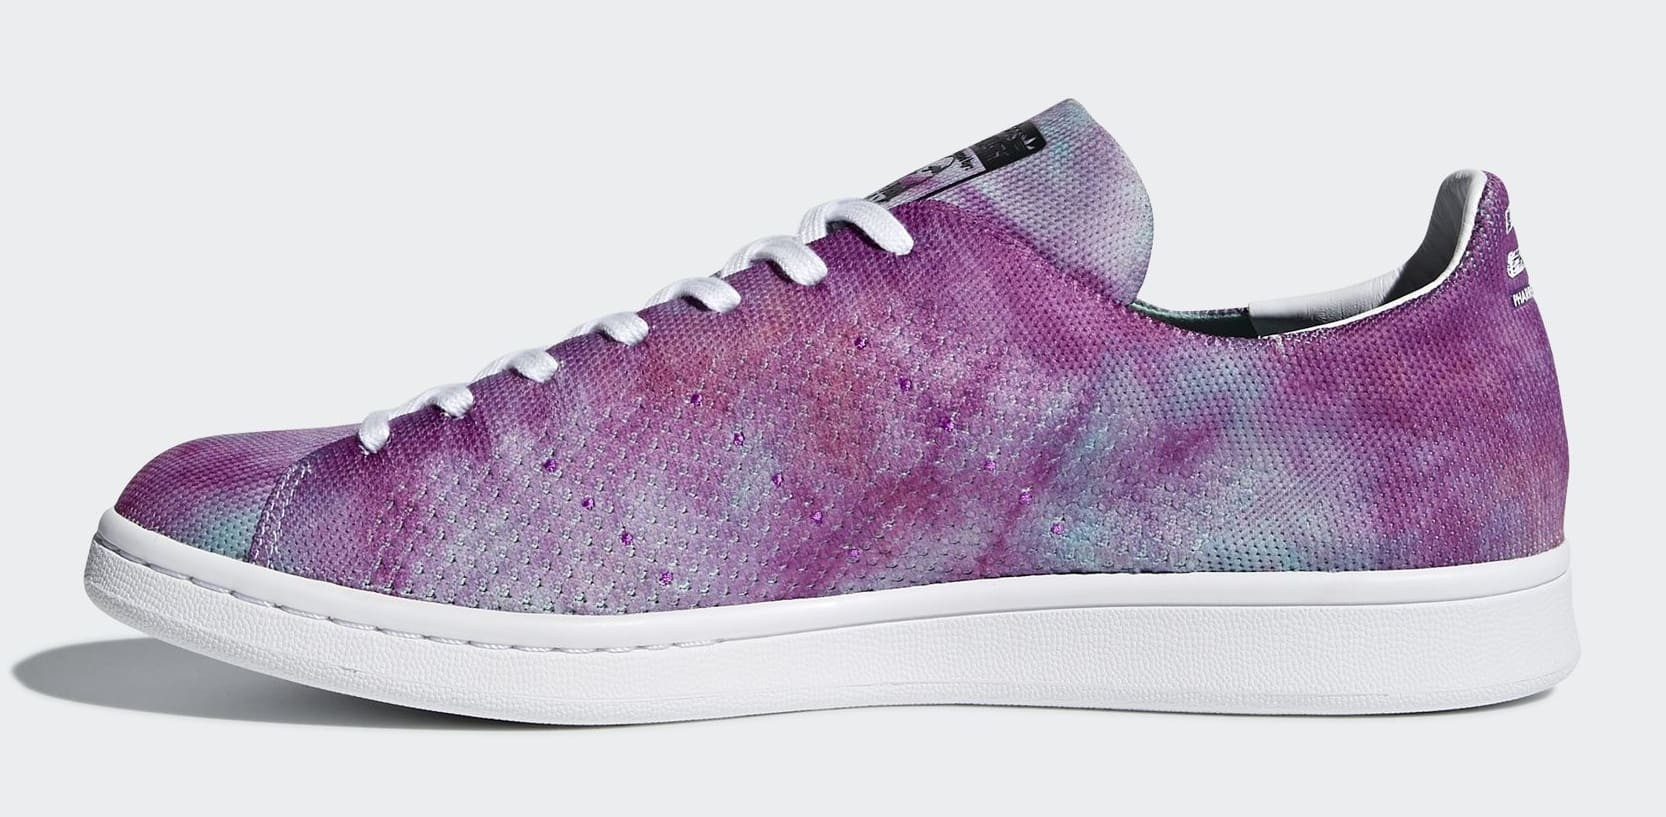 Adidas Pharrell x Stan Smith Hu Holi 'Chalk Coral' DA9612